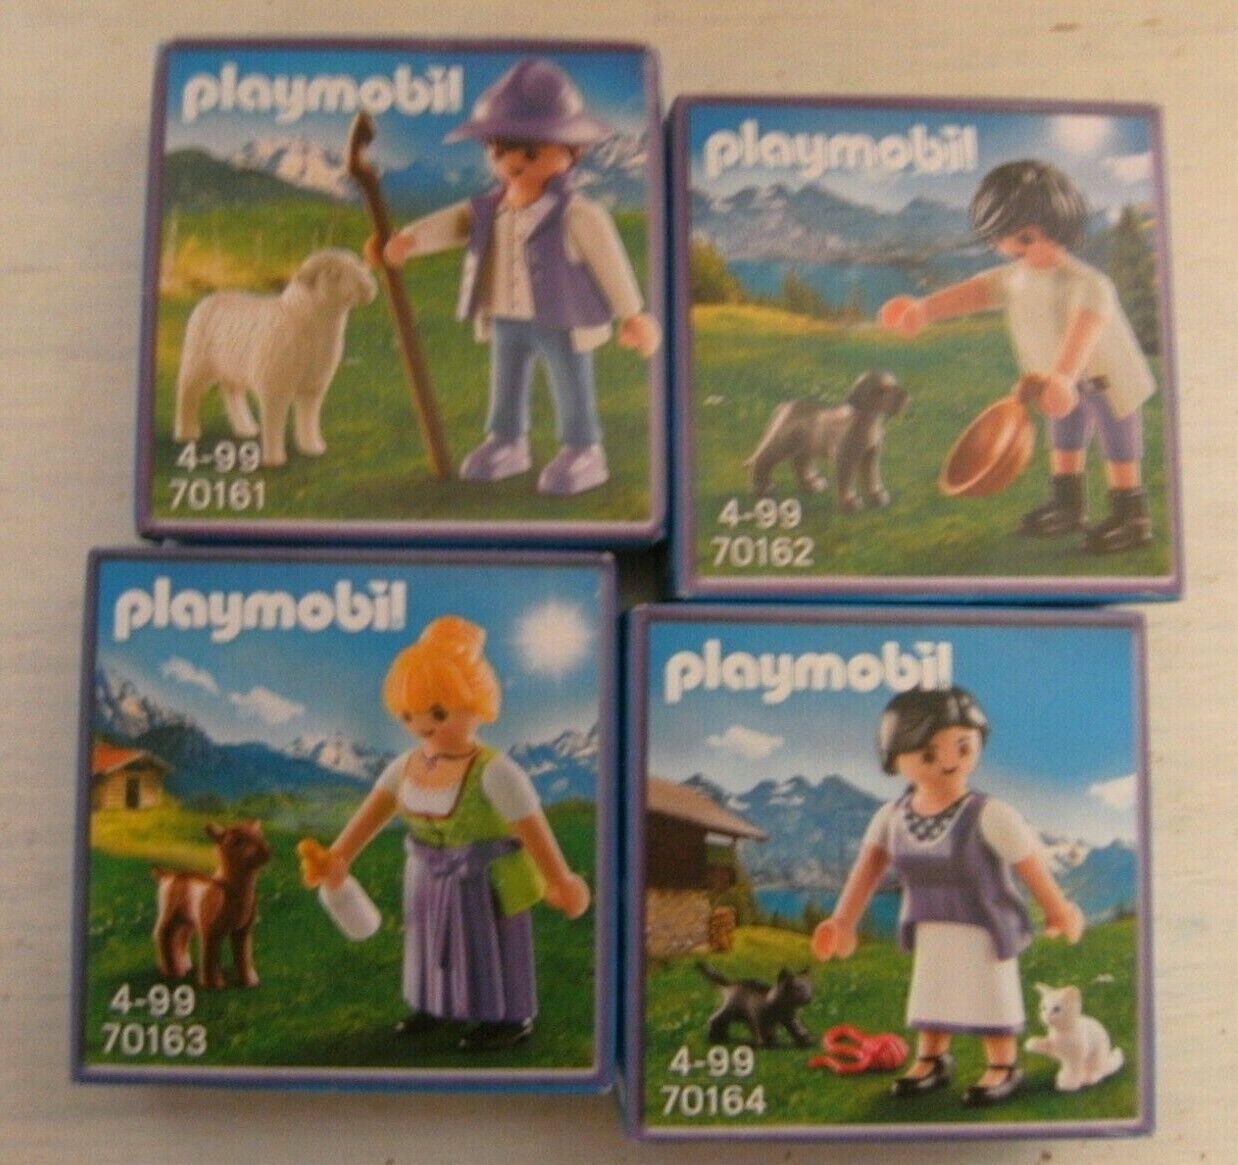 Playmobil 4 x Milka Sonderedition 70161 70162 70163 70164 Neu & OVP limitiert